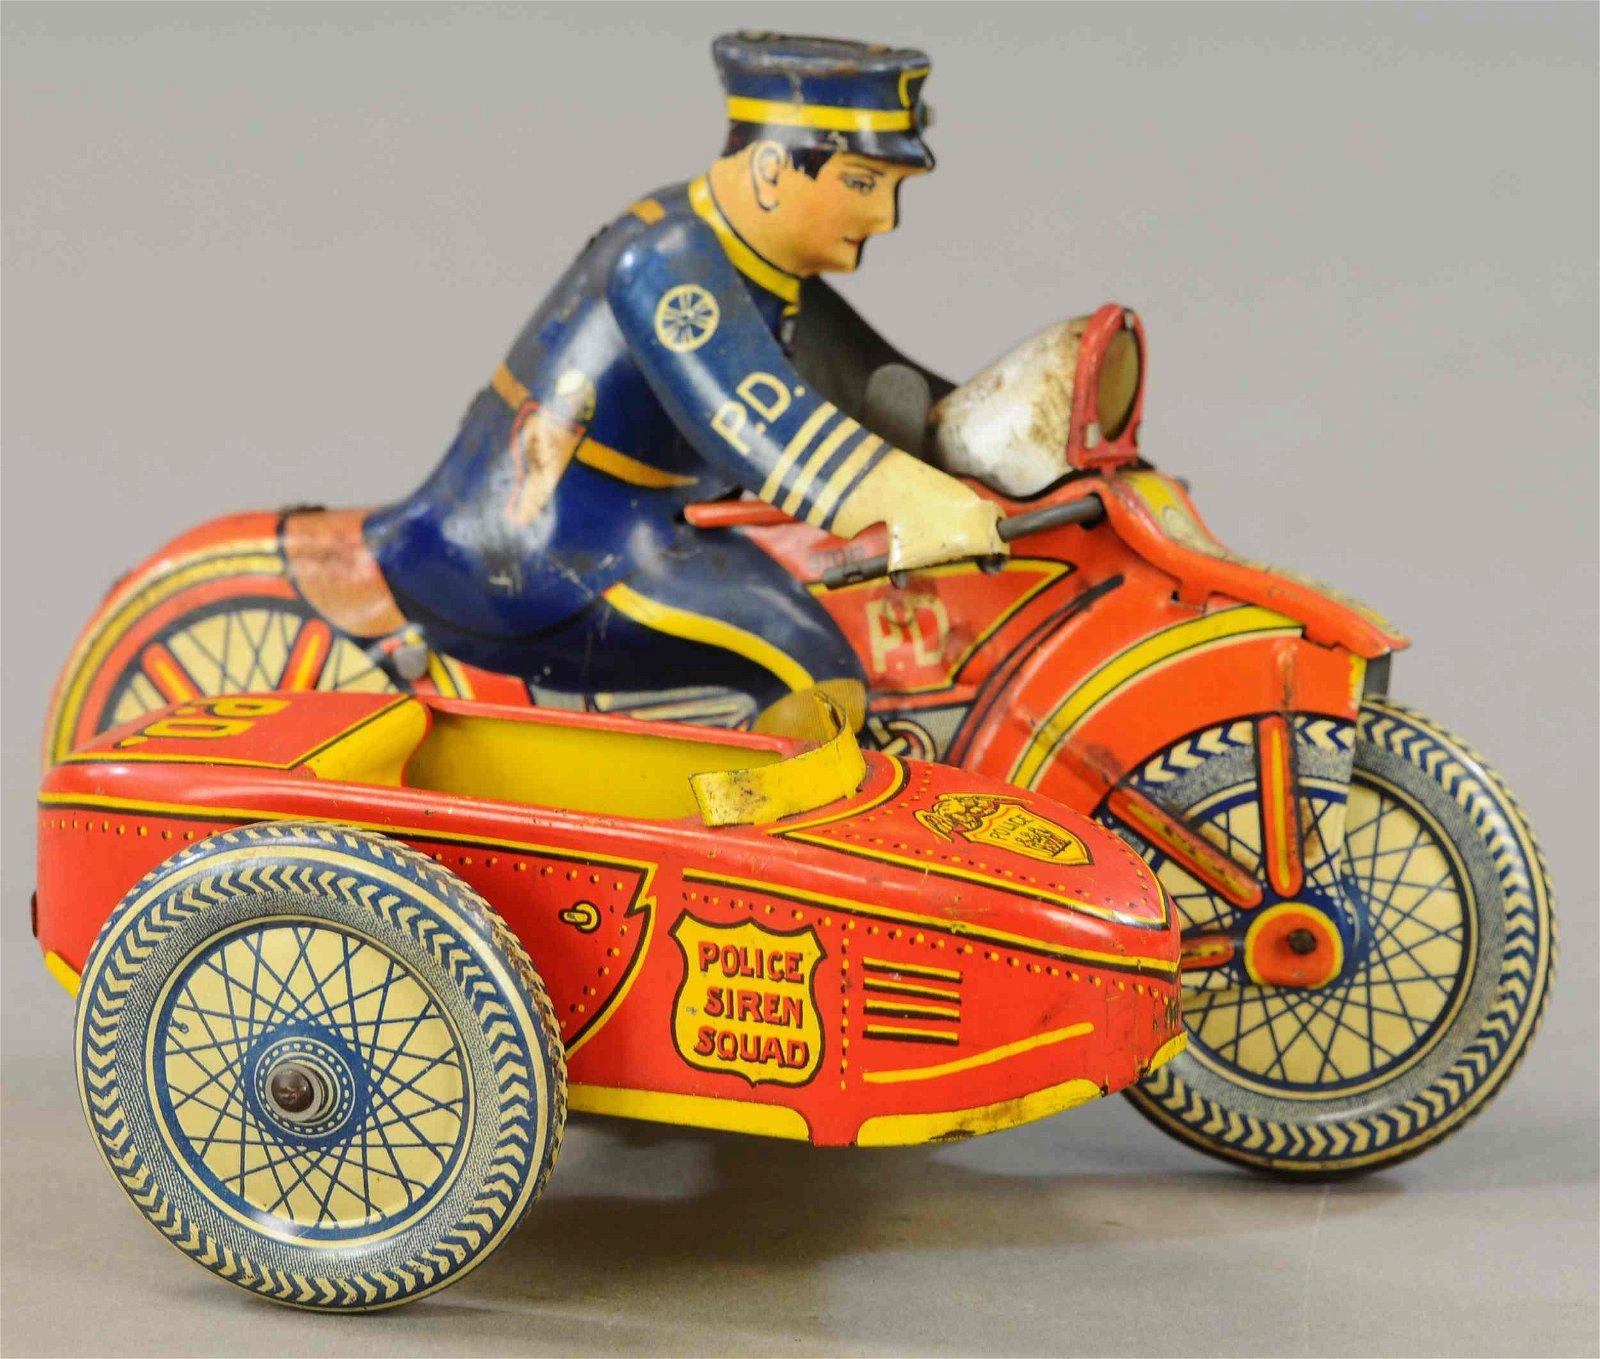 MARX SPARKLING POLICE CYCLE W/ SIDECAR